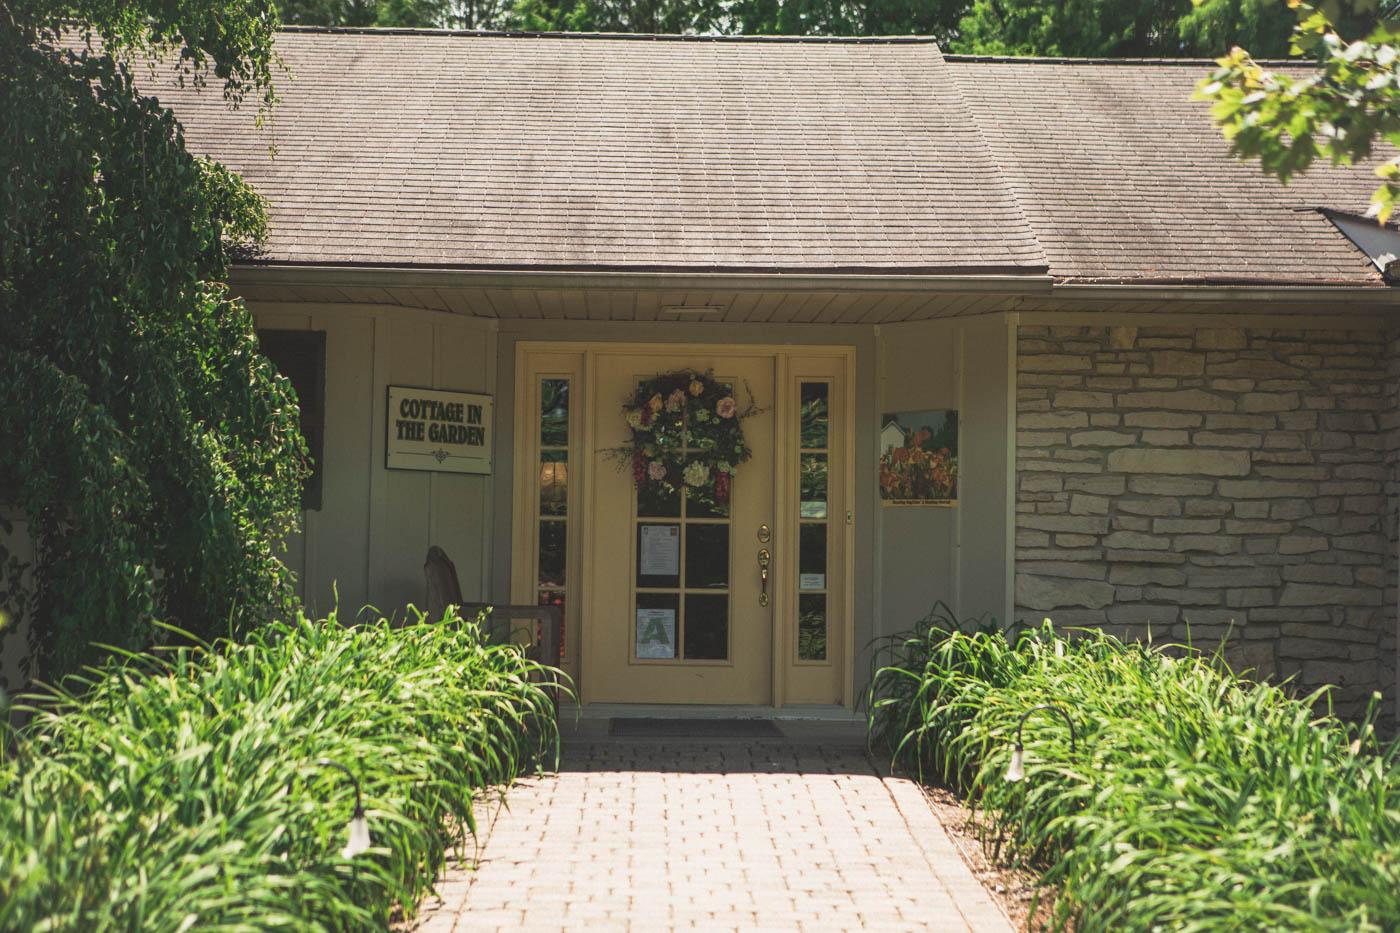 Botanical Gardens Hosting Soup Day for Kids - Owensboro Living